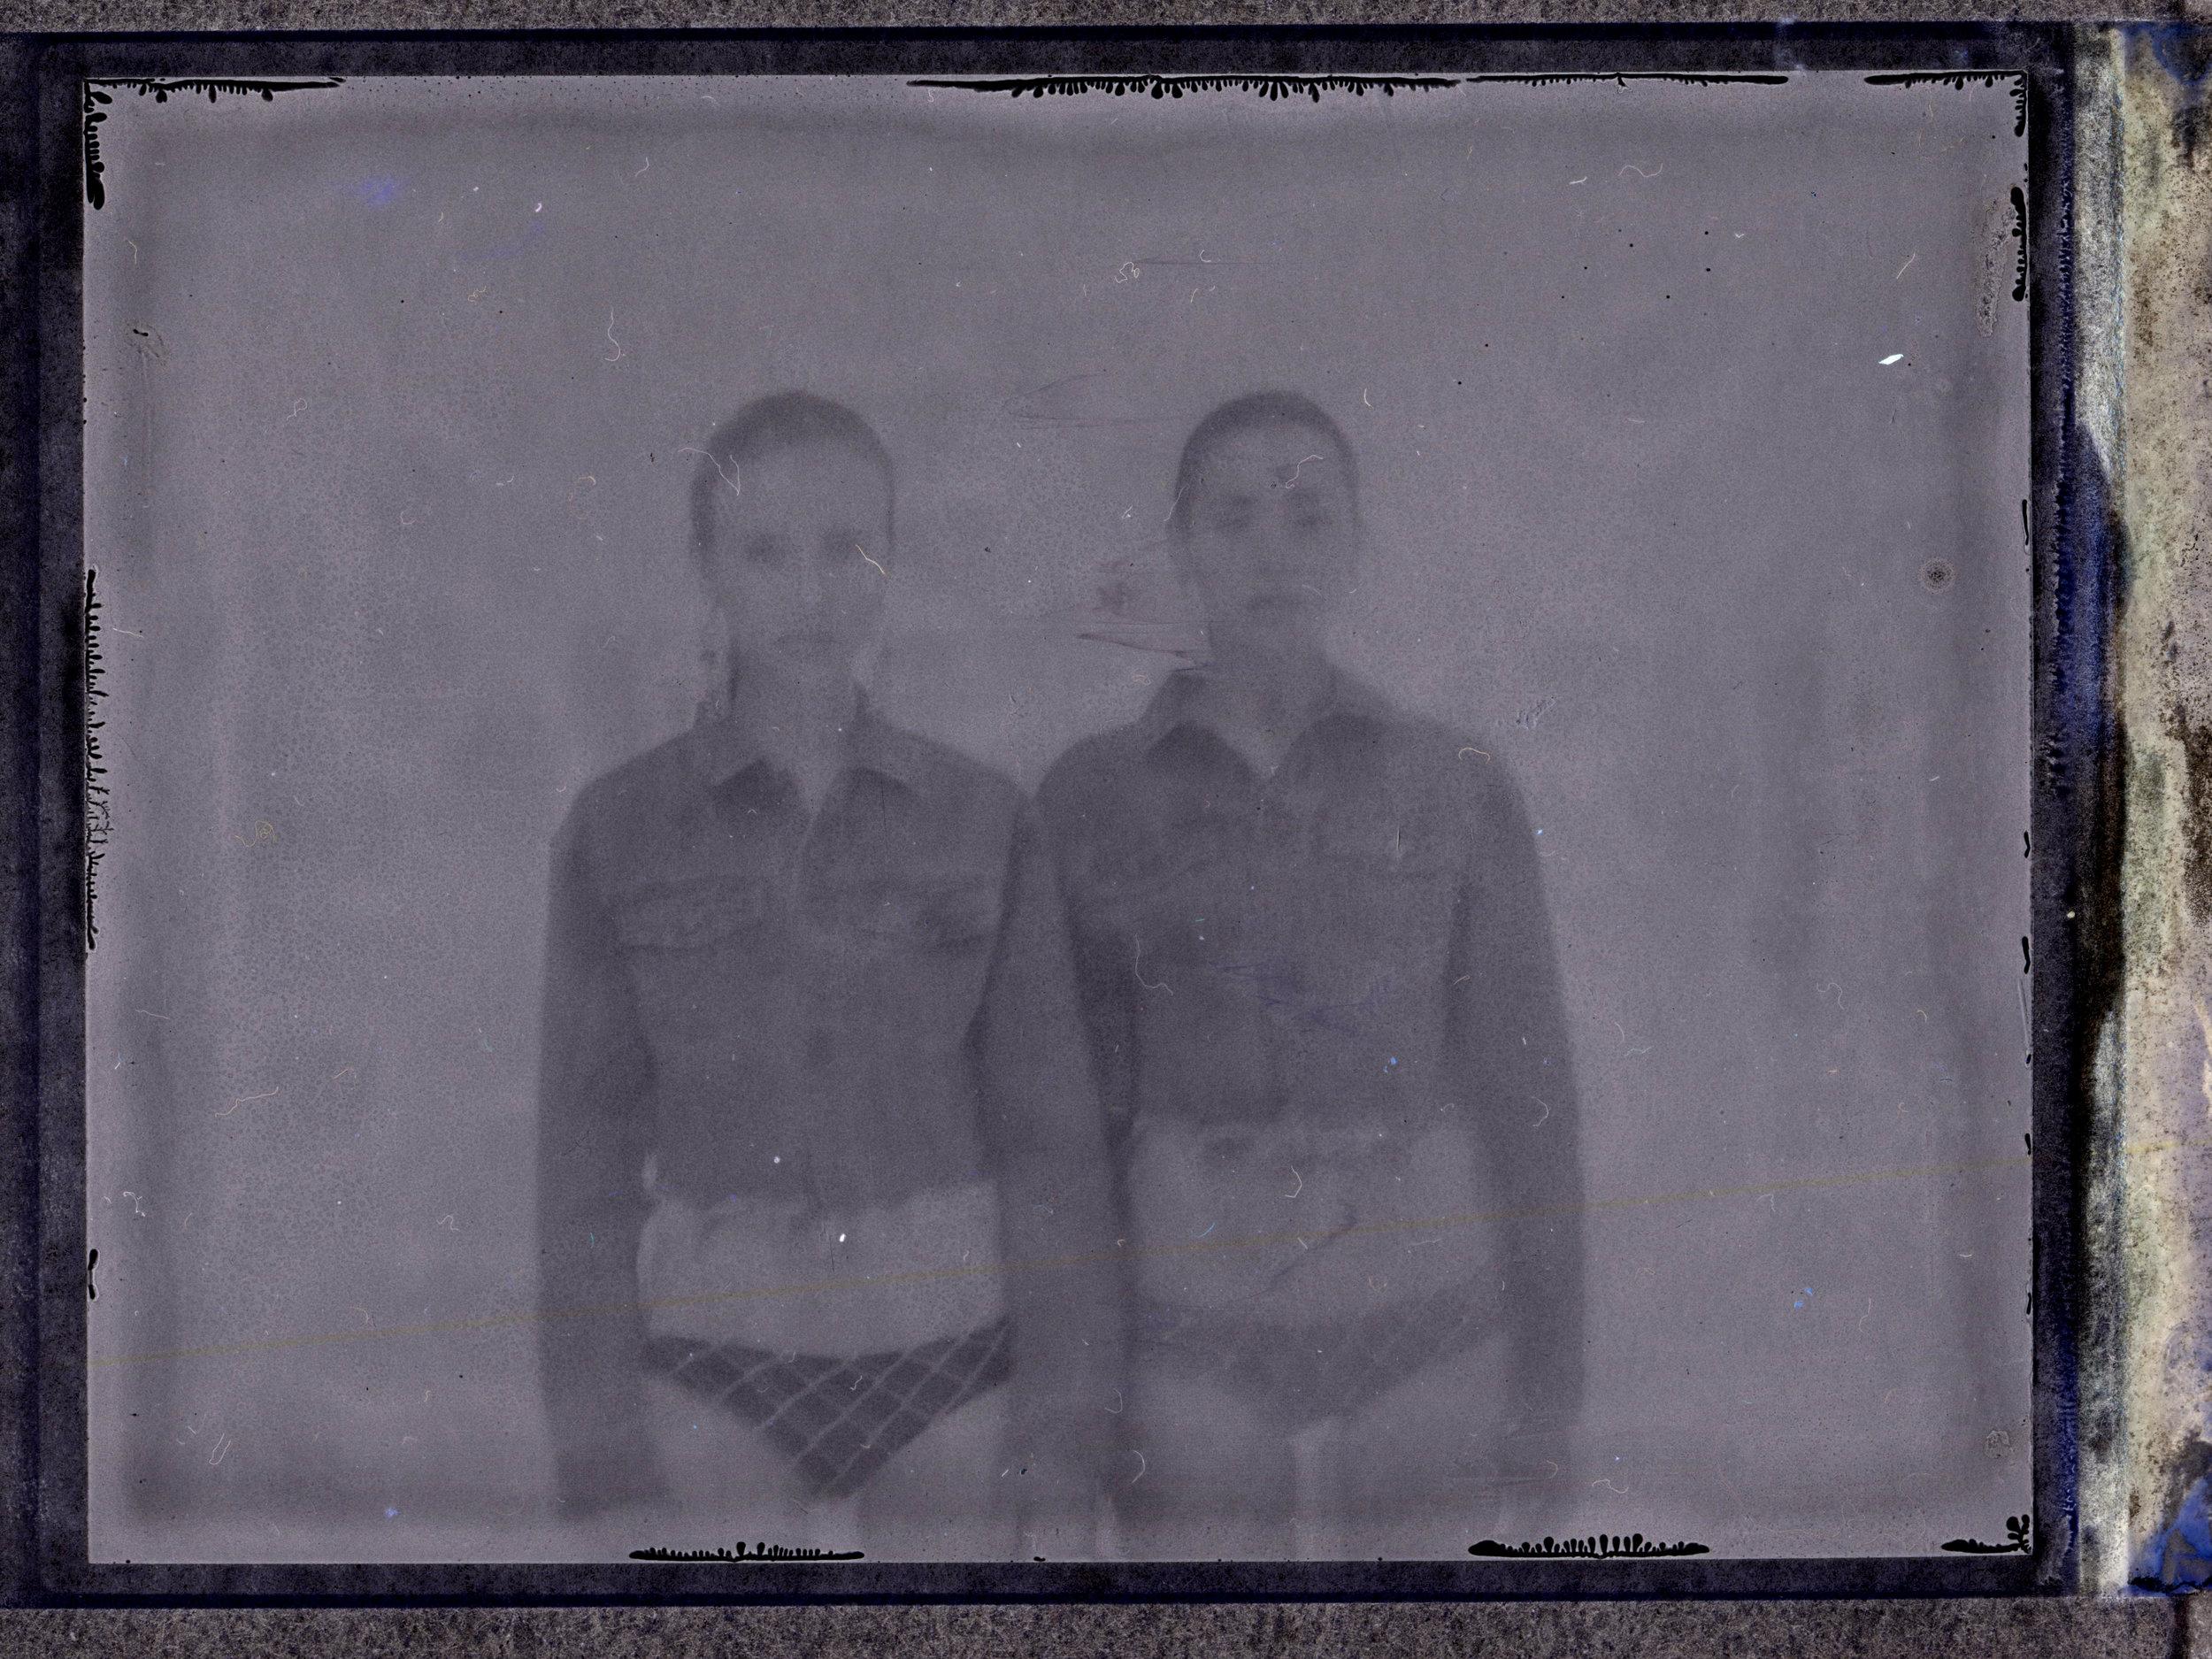 Julia+and+Amanda+Polaroid+Negative.jpg